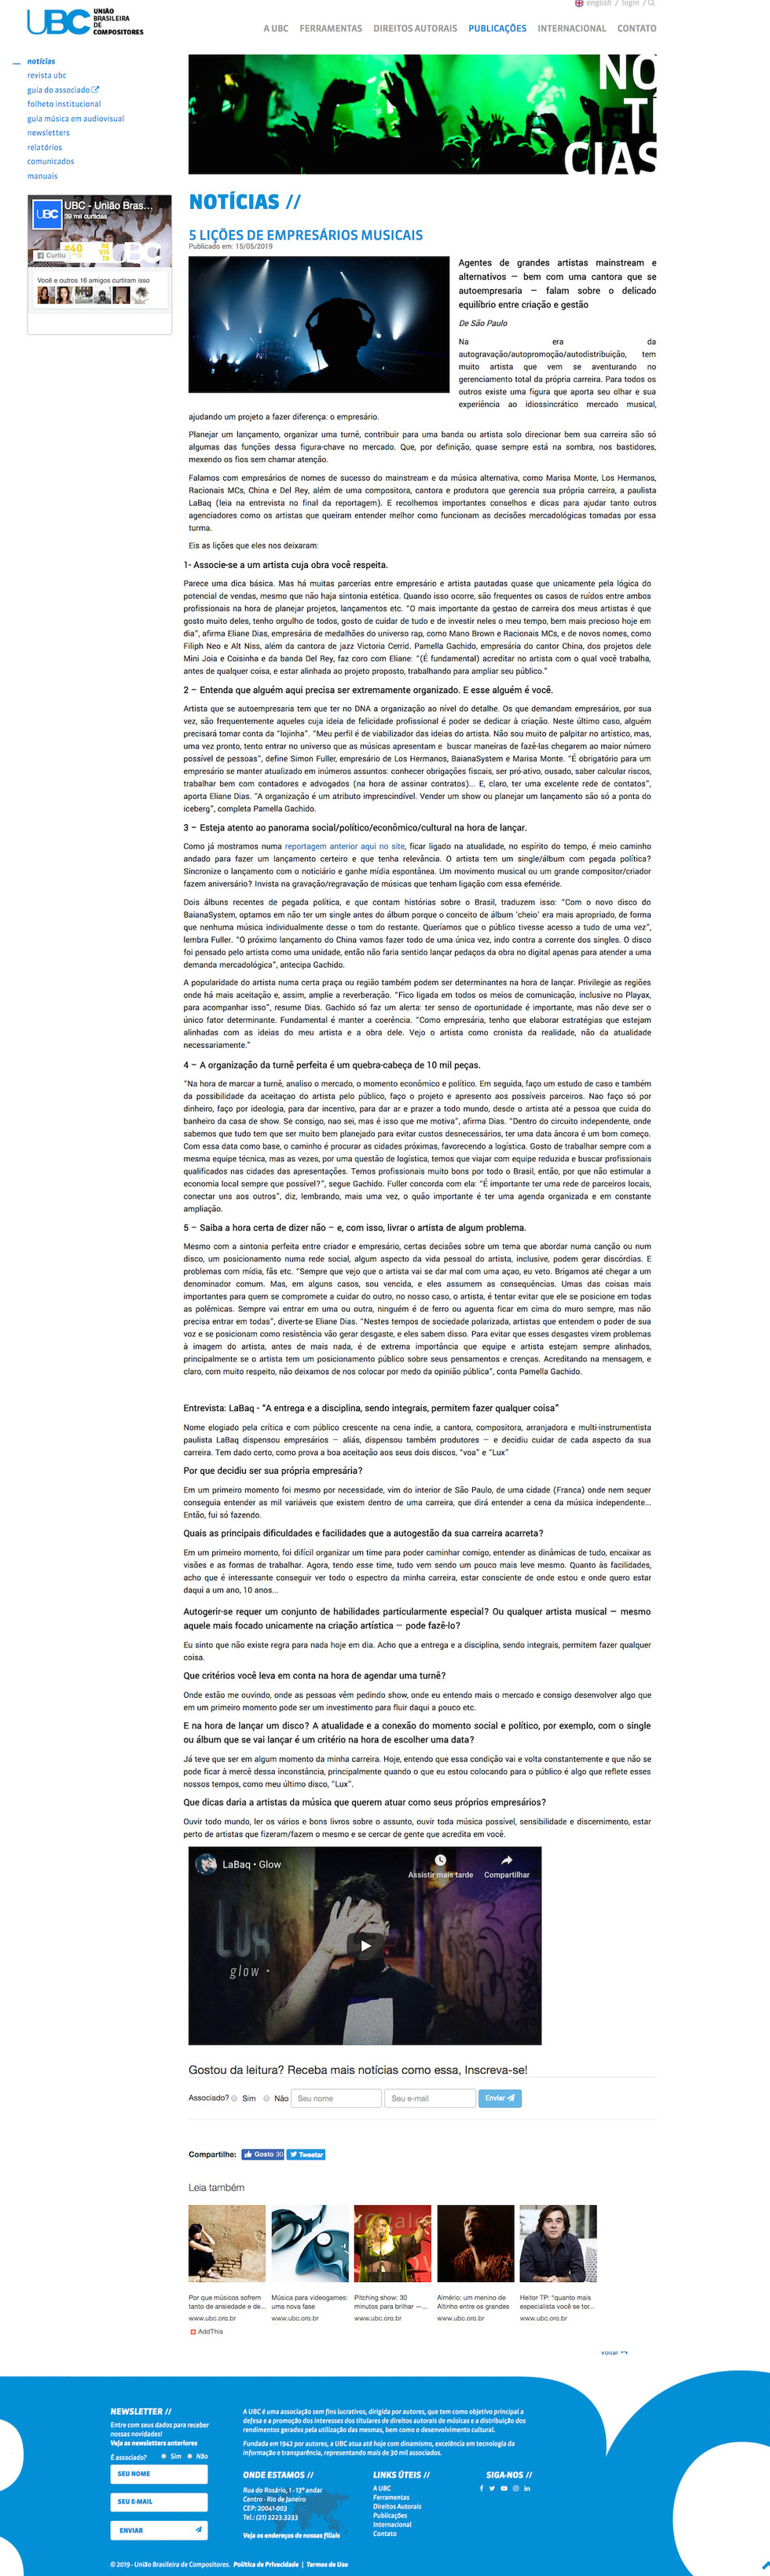 Pamella.0515.RevistaUBC.jpg